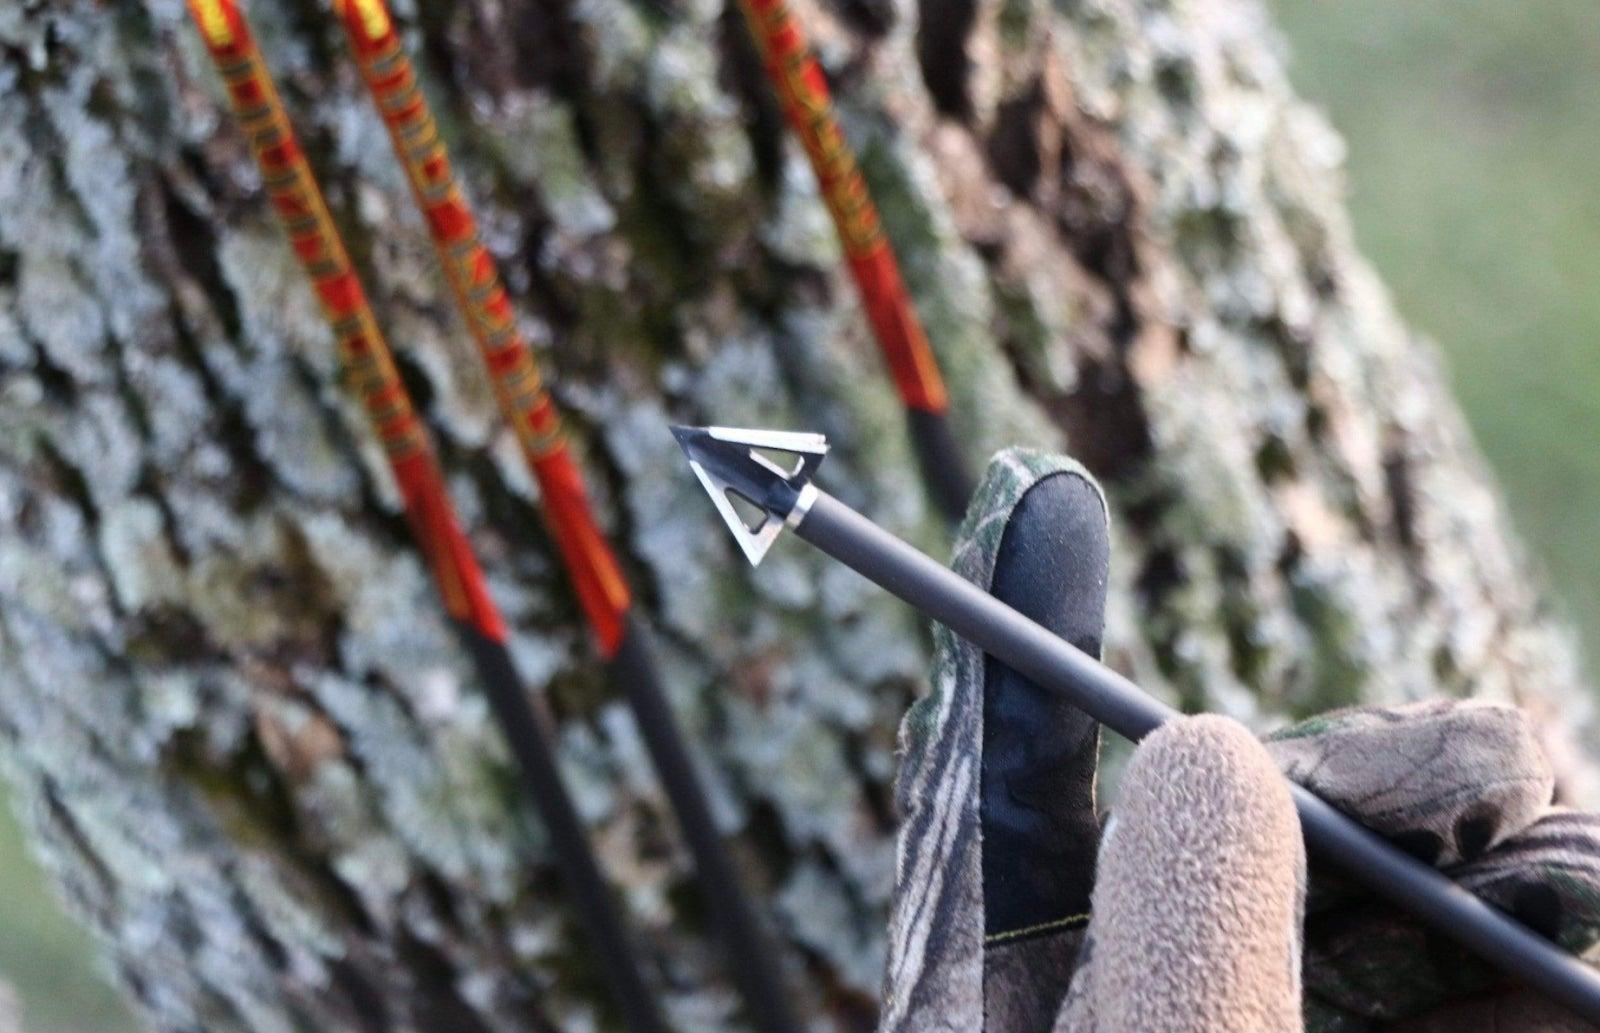 tooth of arrow broadhead